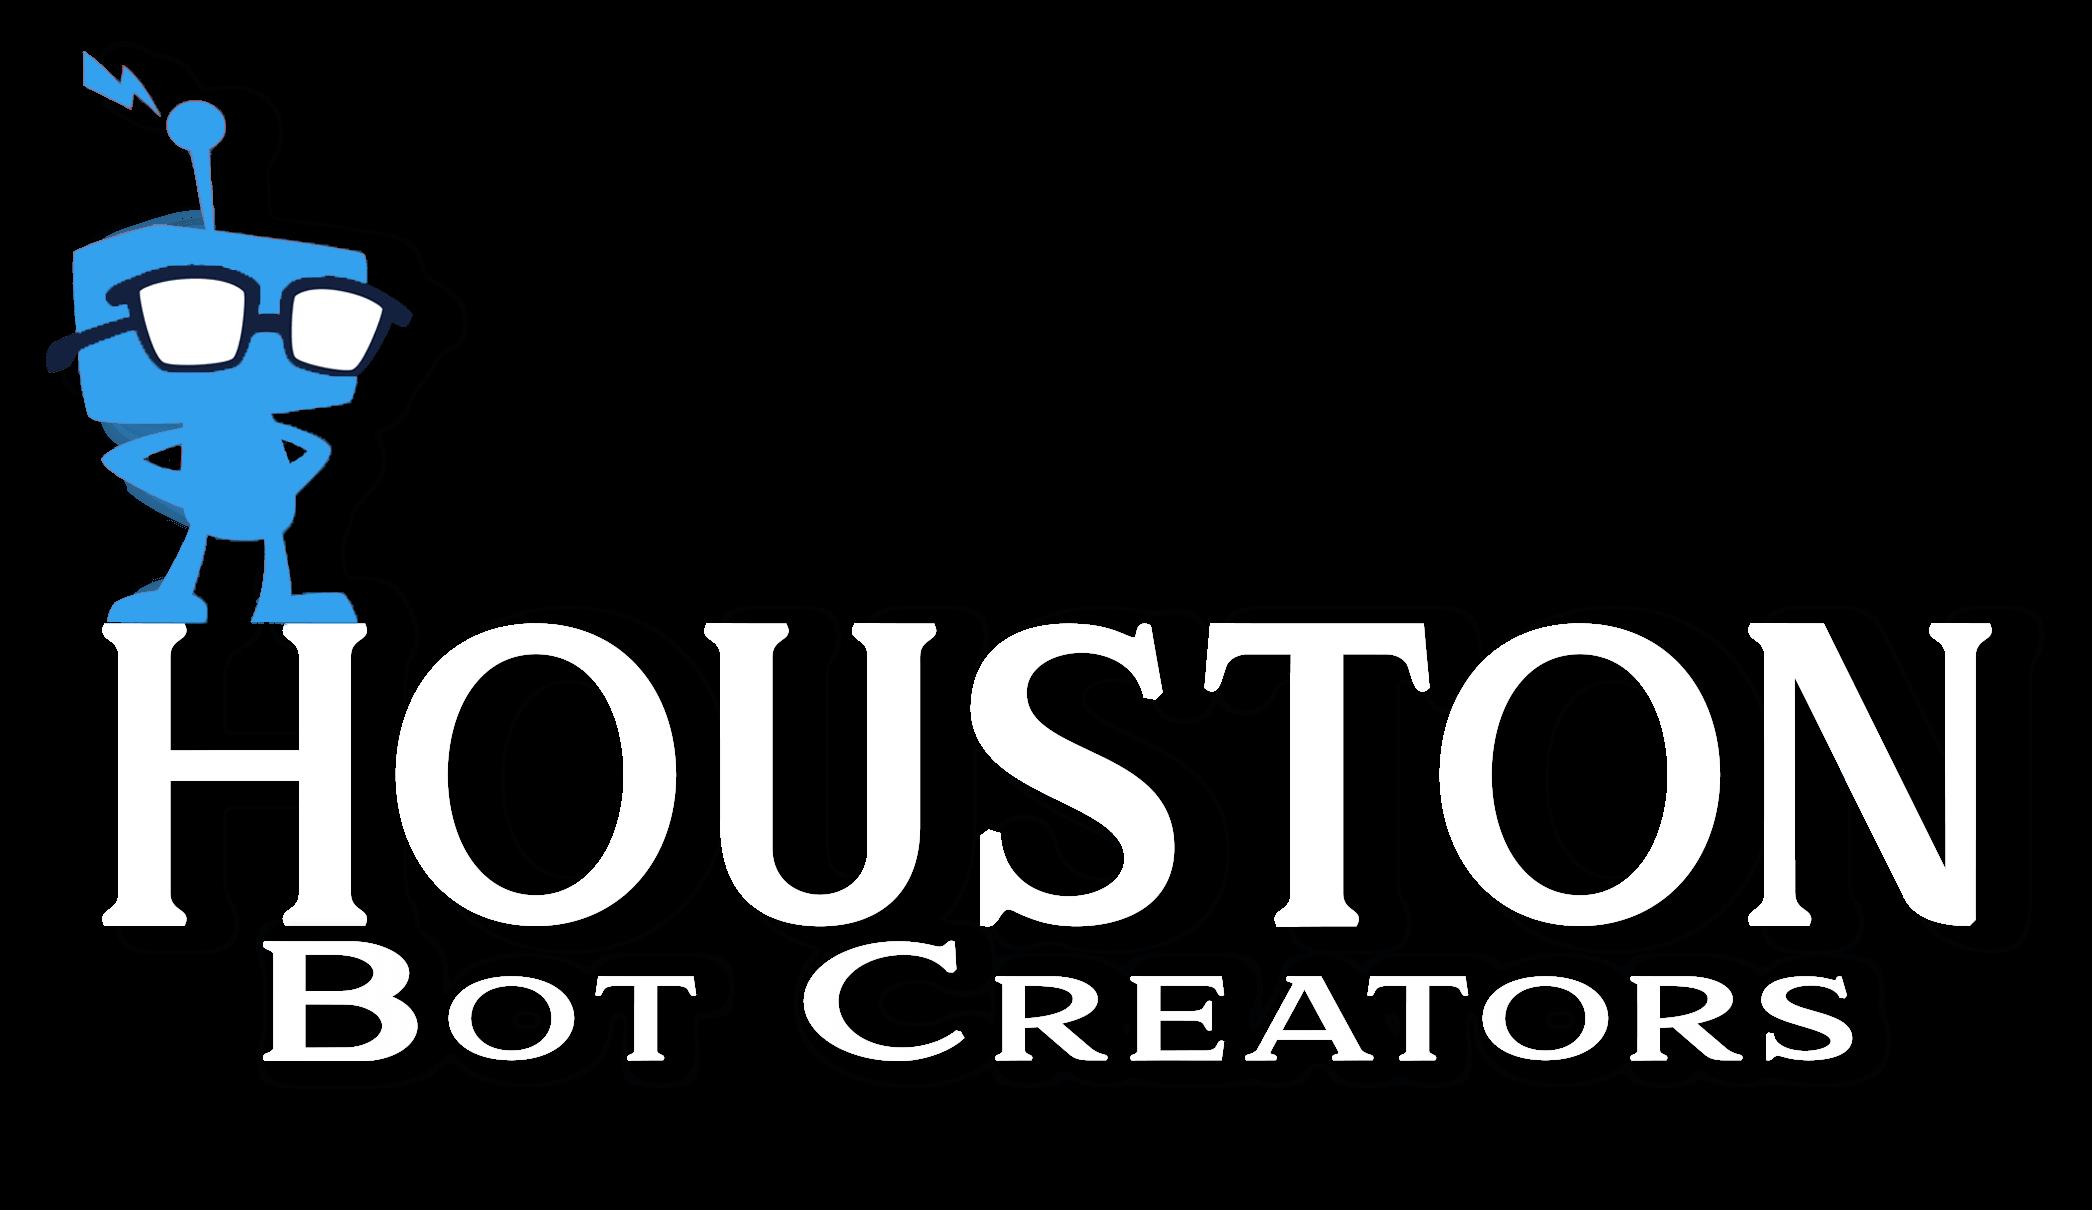 Houston Bot Creators, a chatbot developer